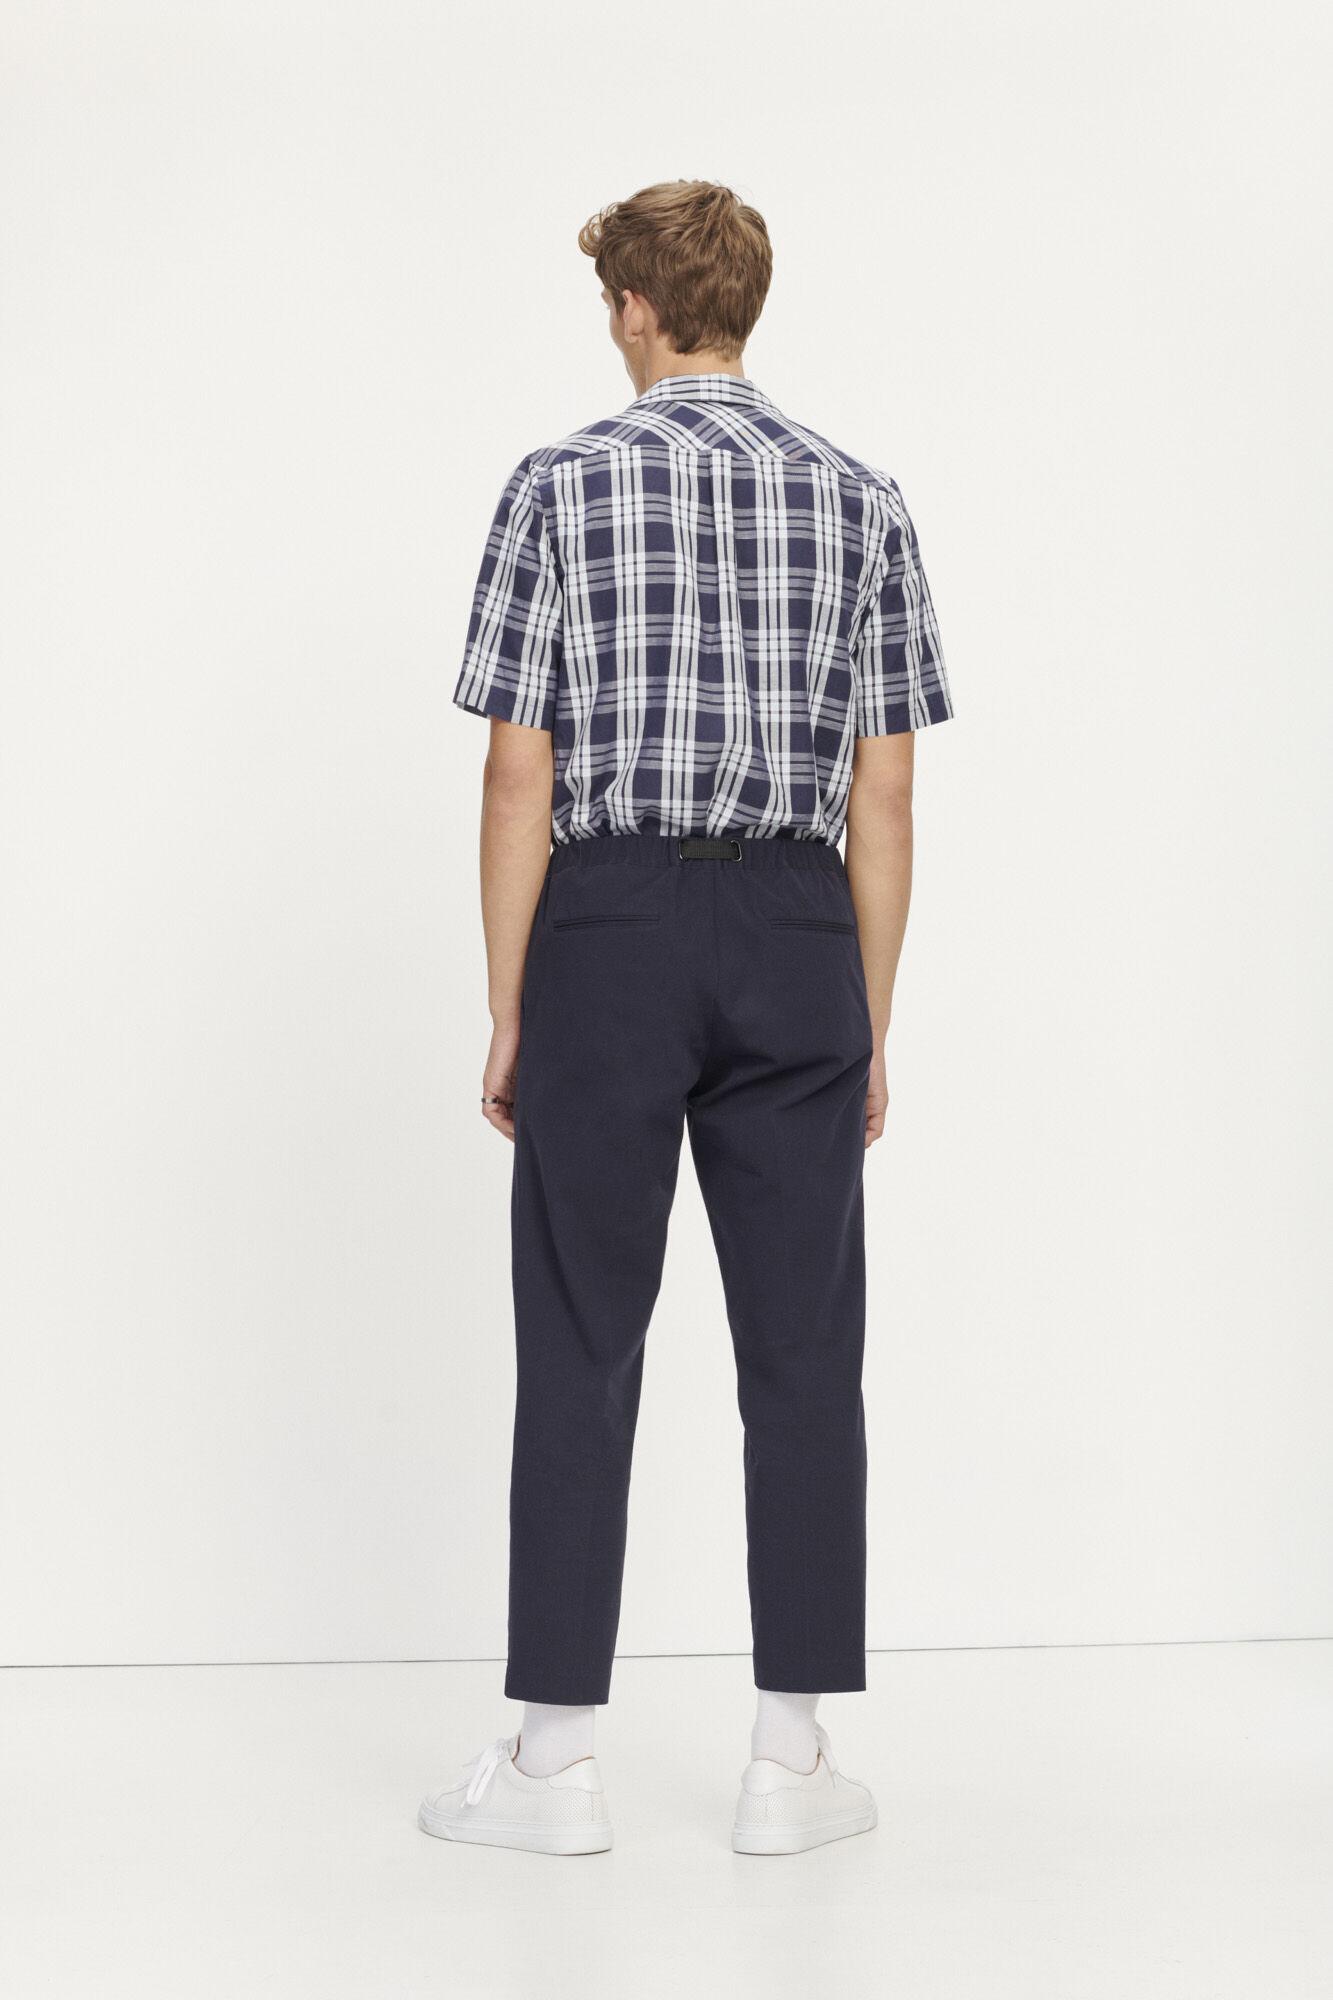 Oscar AO shirt 11376